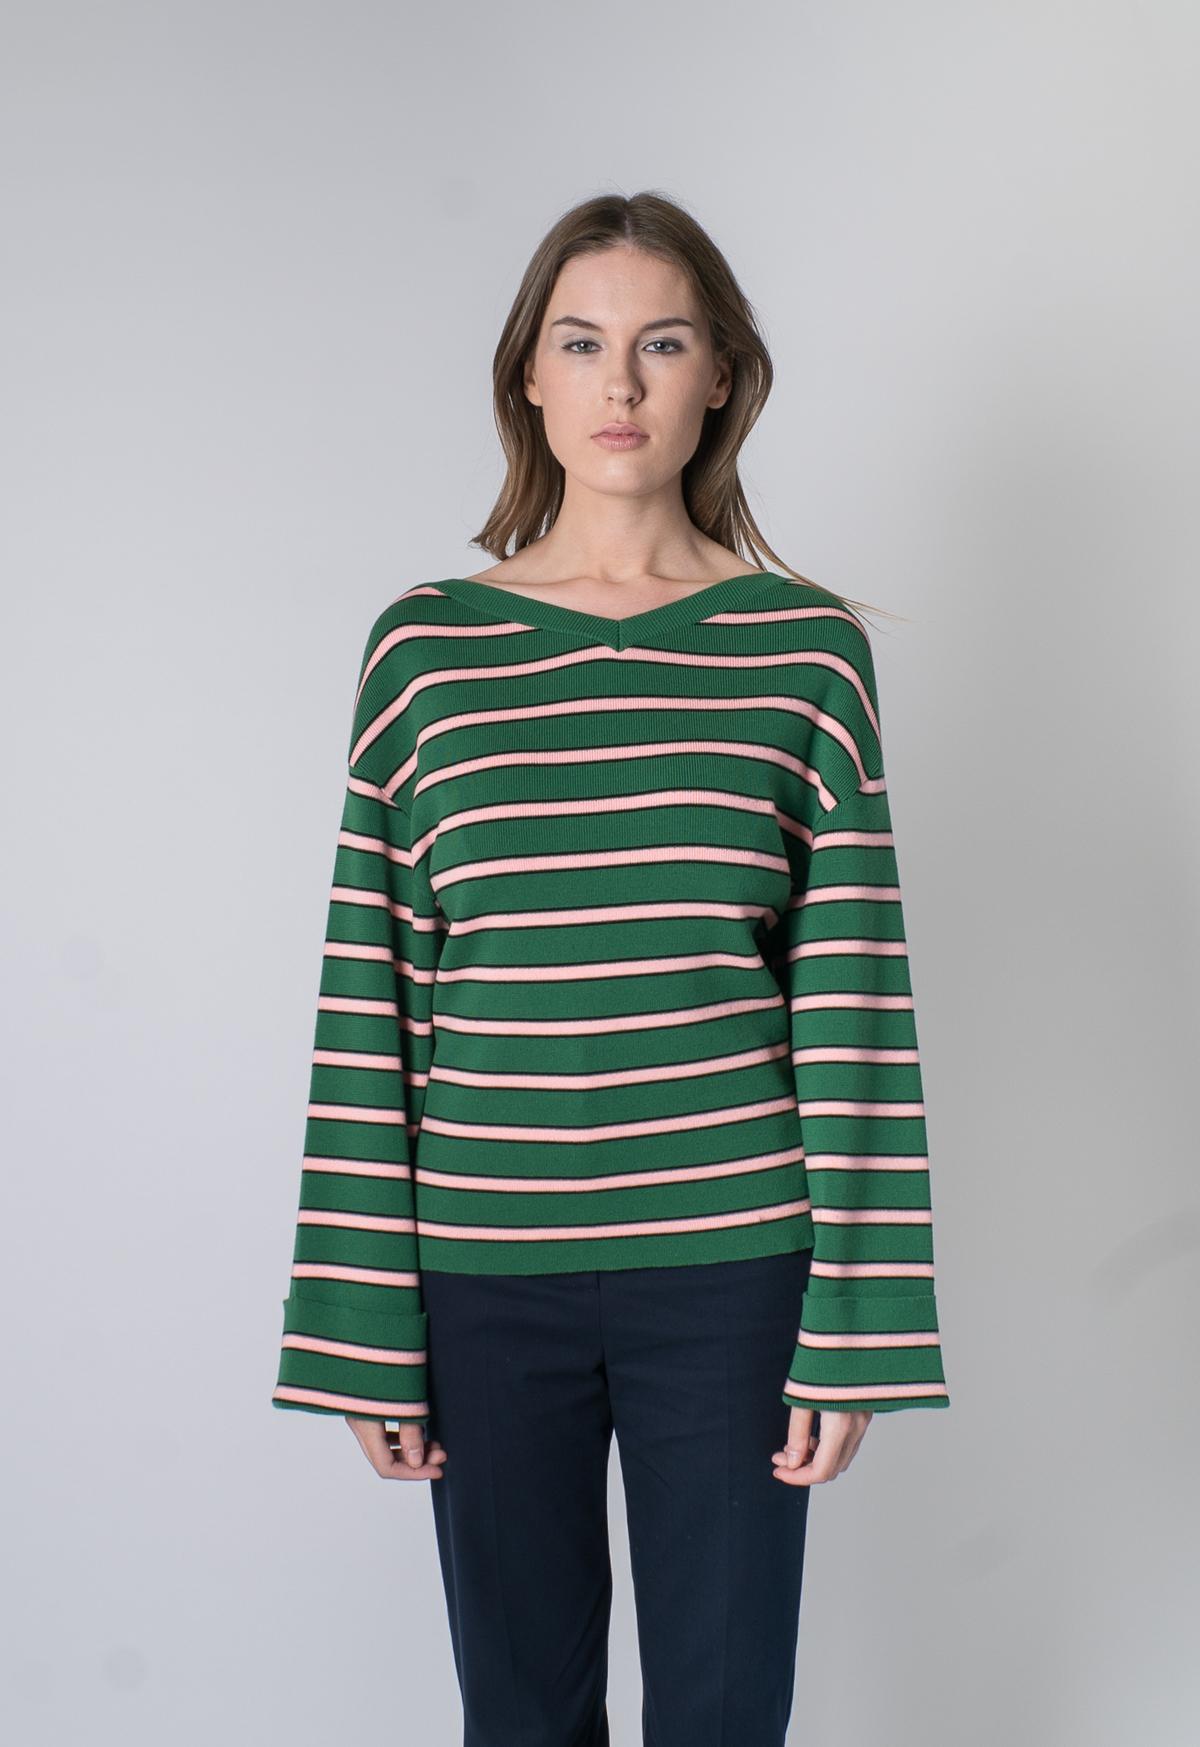 f192ec33d5d4 Alexa Chung Oversized Striped Knit - Green Pink